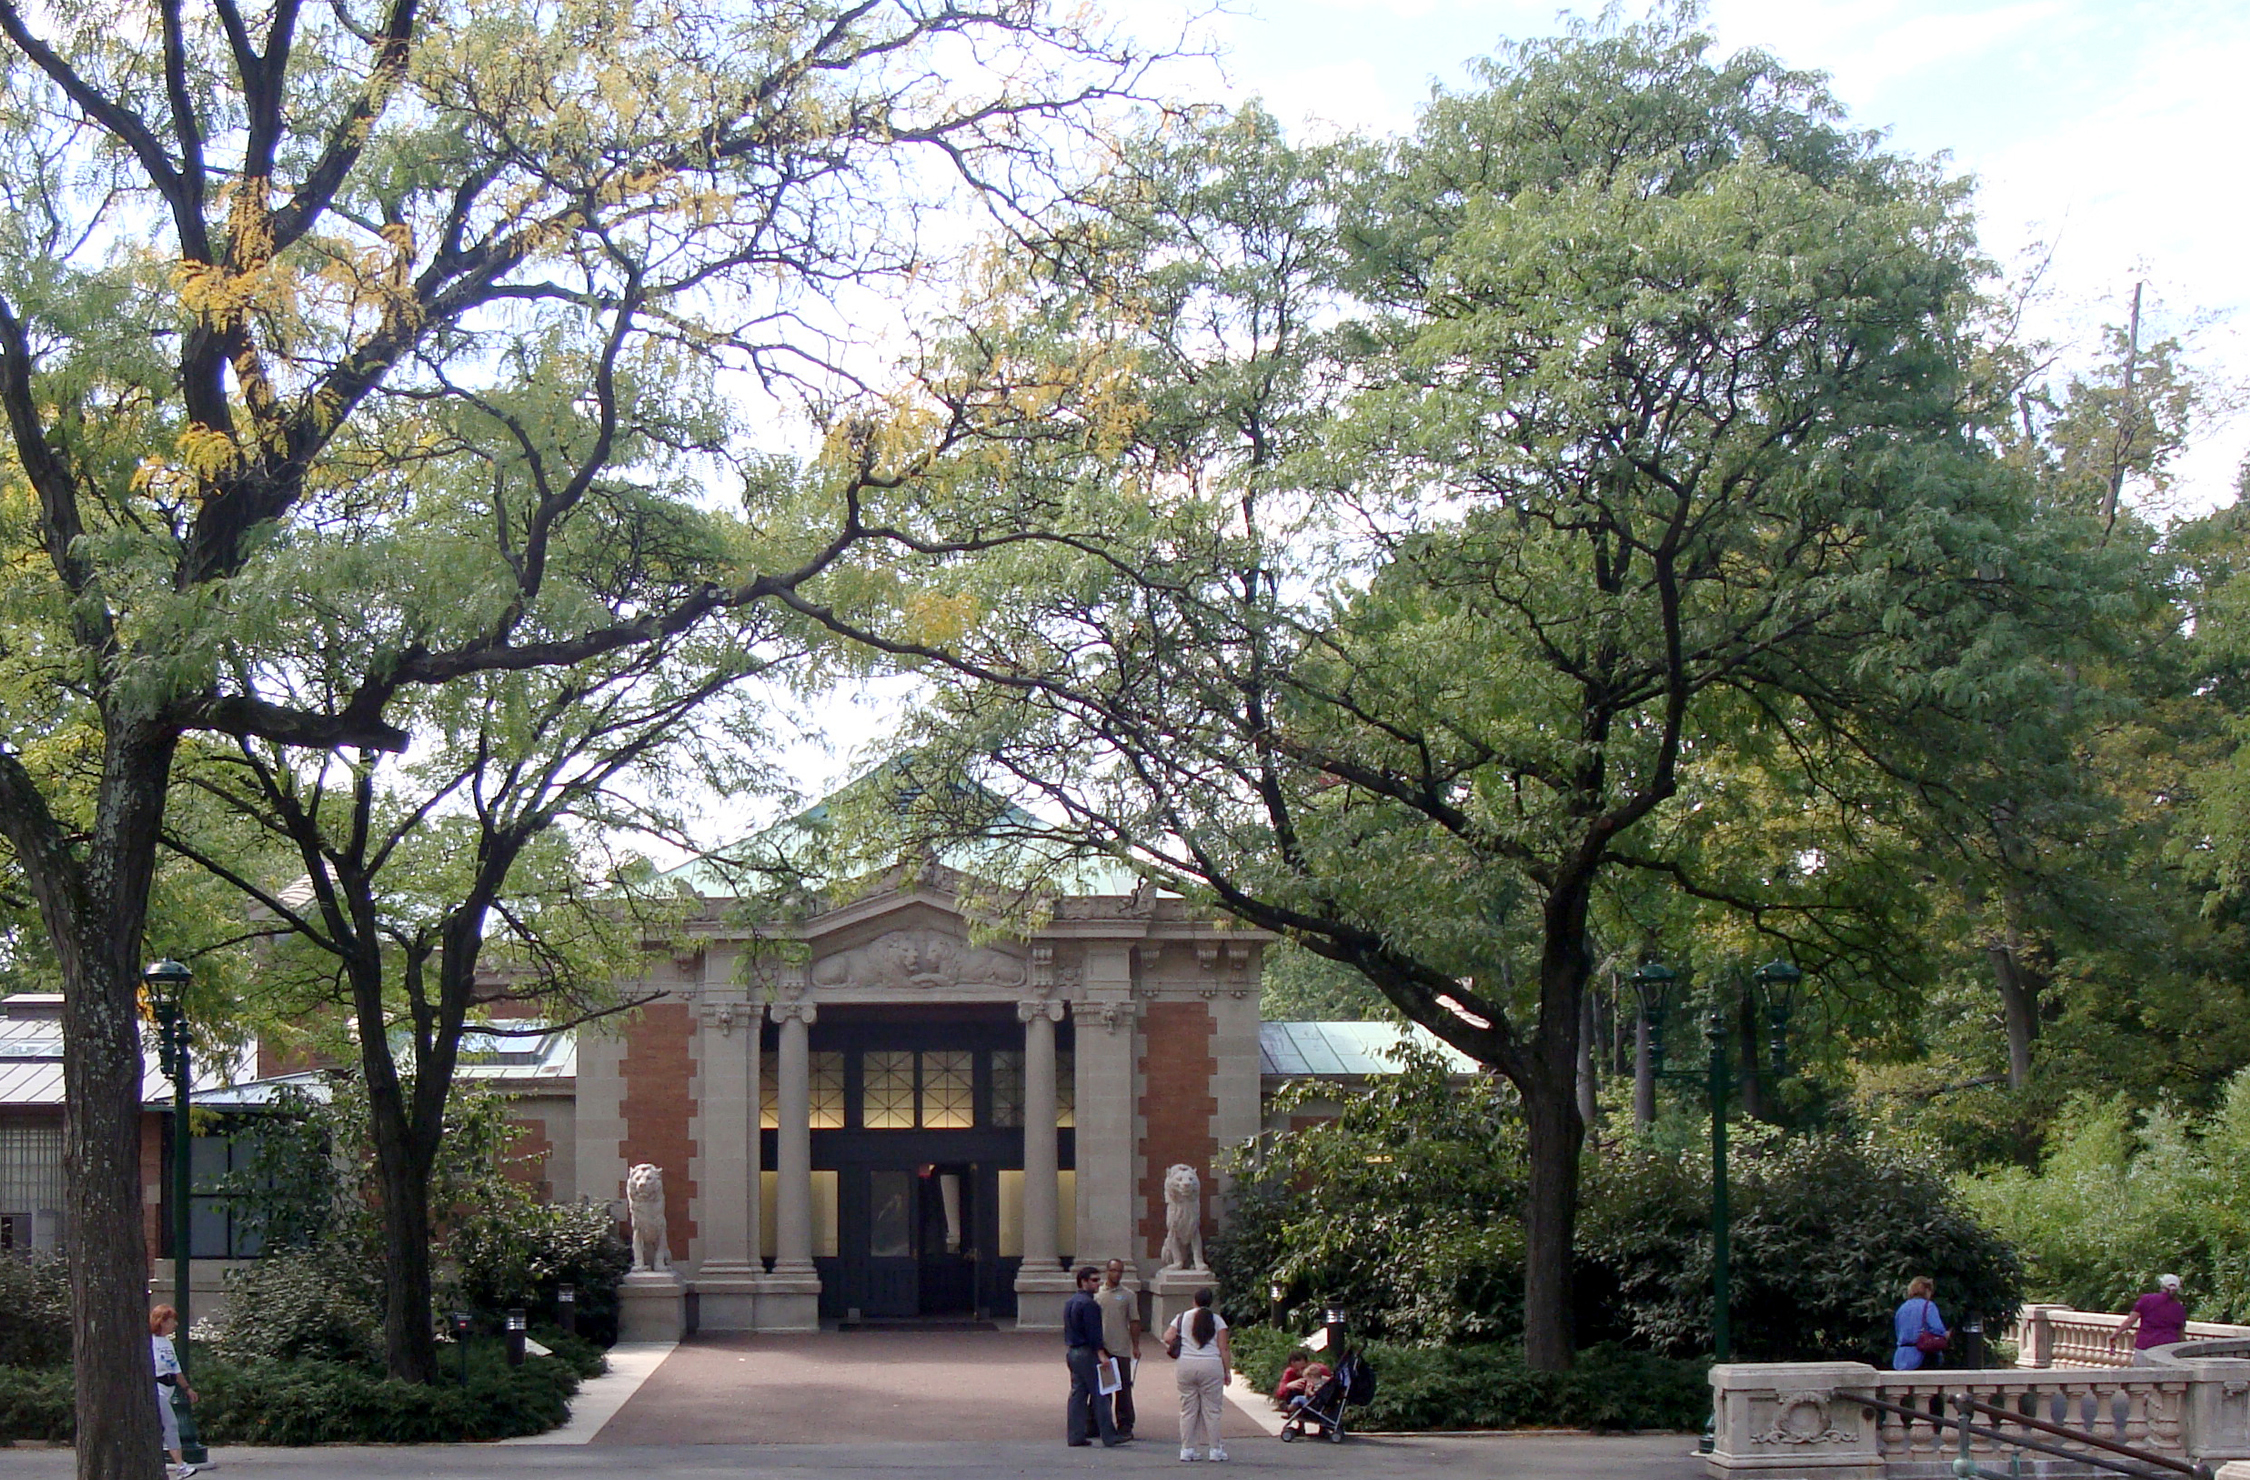 Bronx Zoo landscape architecture